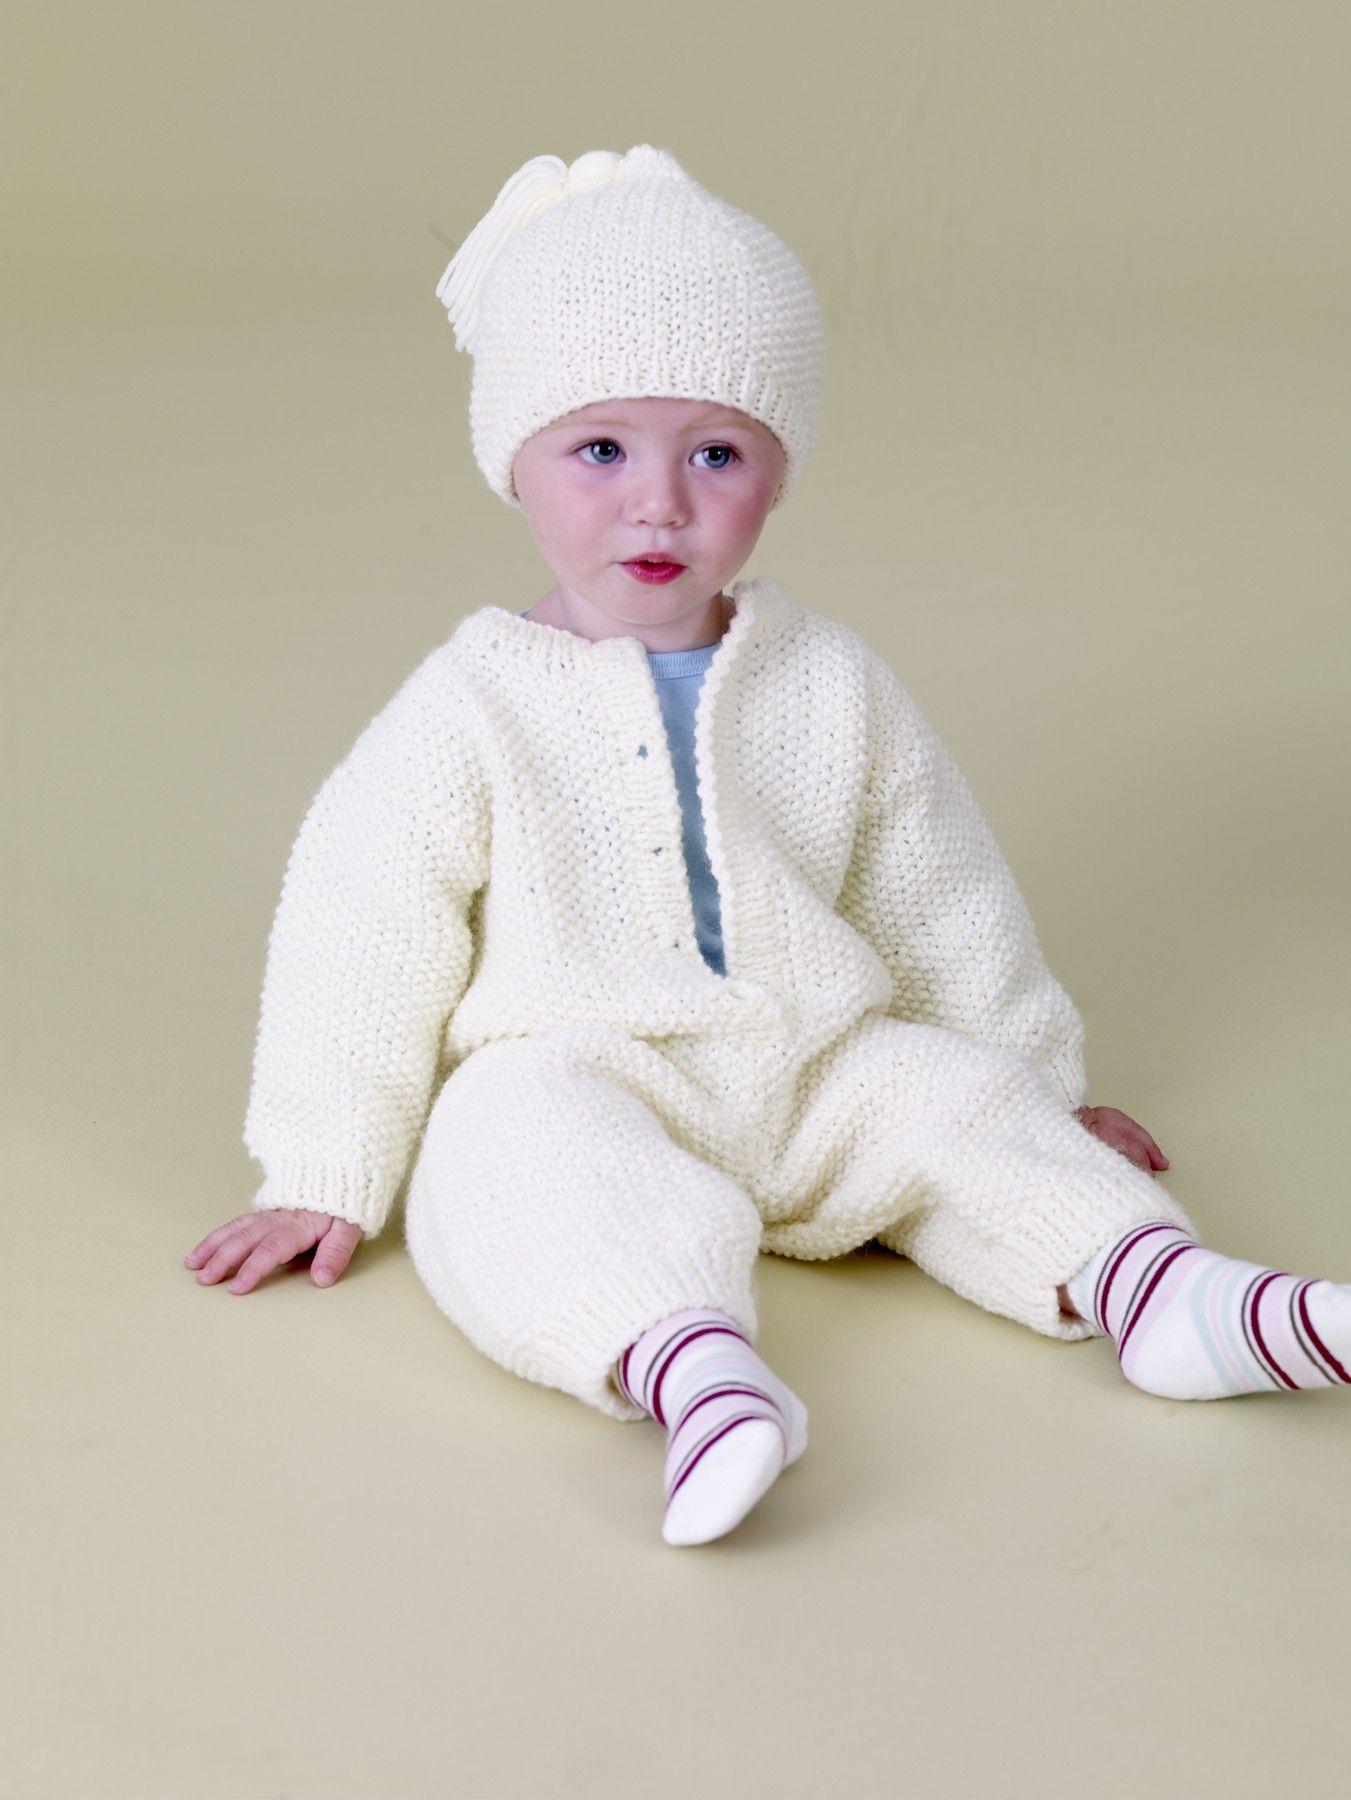 Baby Love Romper and Hat Pattern (Knit)   Adaline   Pinterest ...